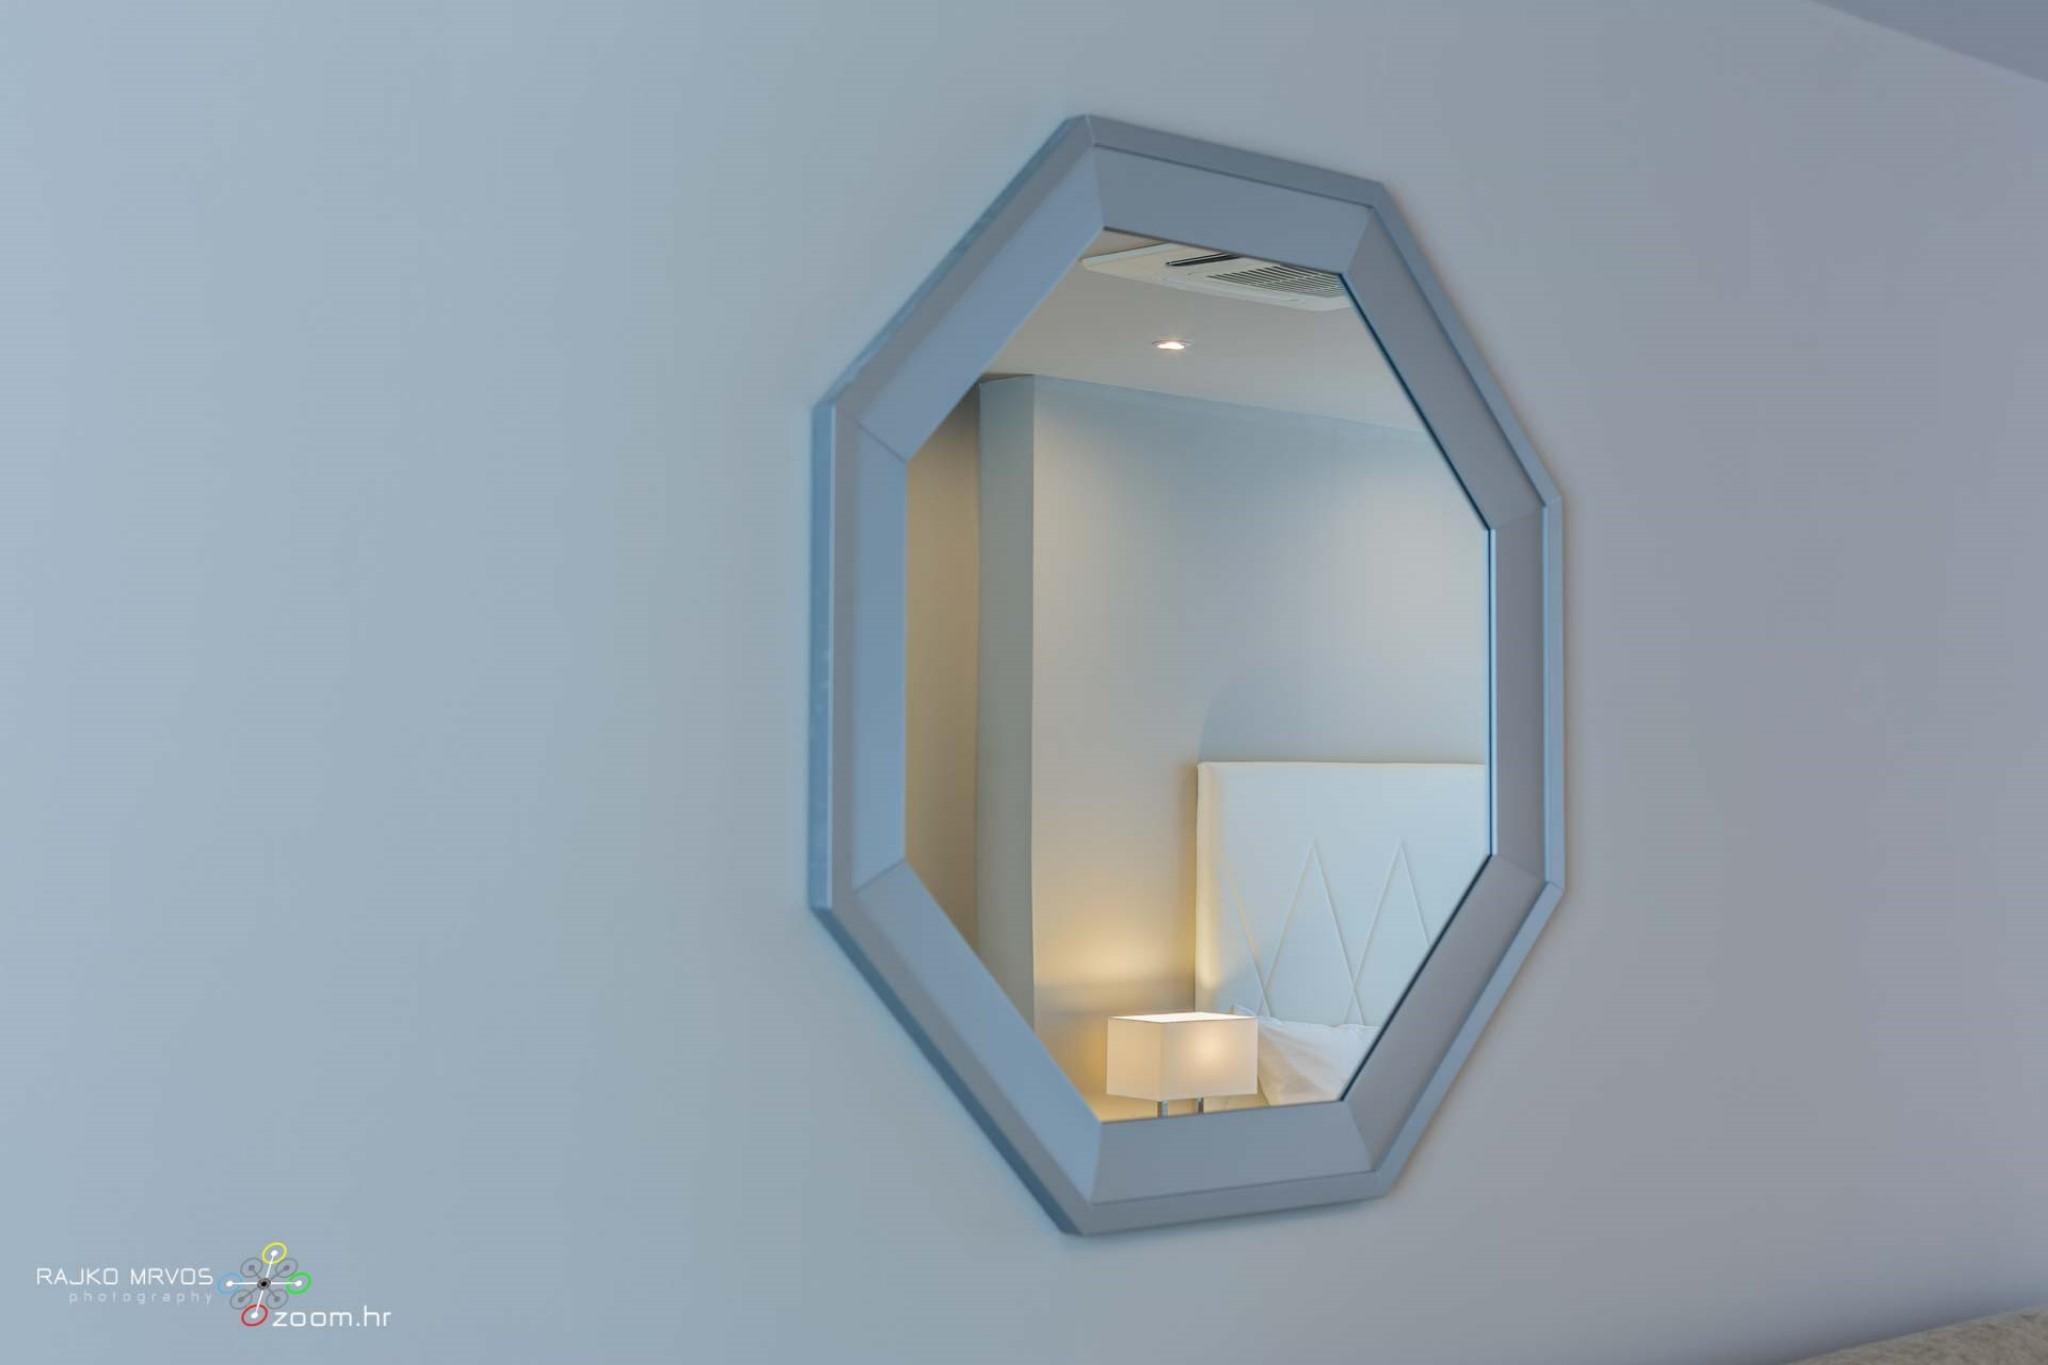 fotografiranje-interijera-fotograf-eksterijera-apartmana-vila-kuca-apartman-Preelook-39